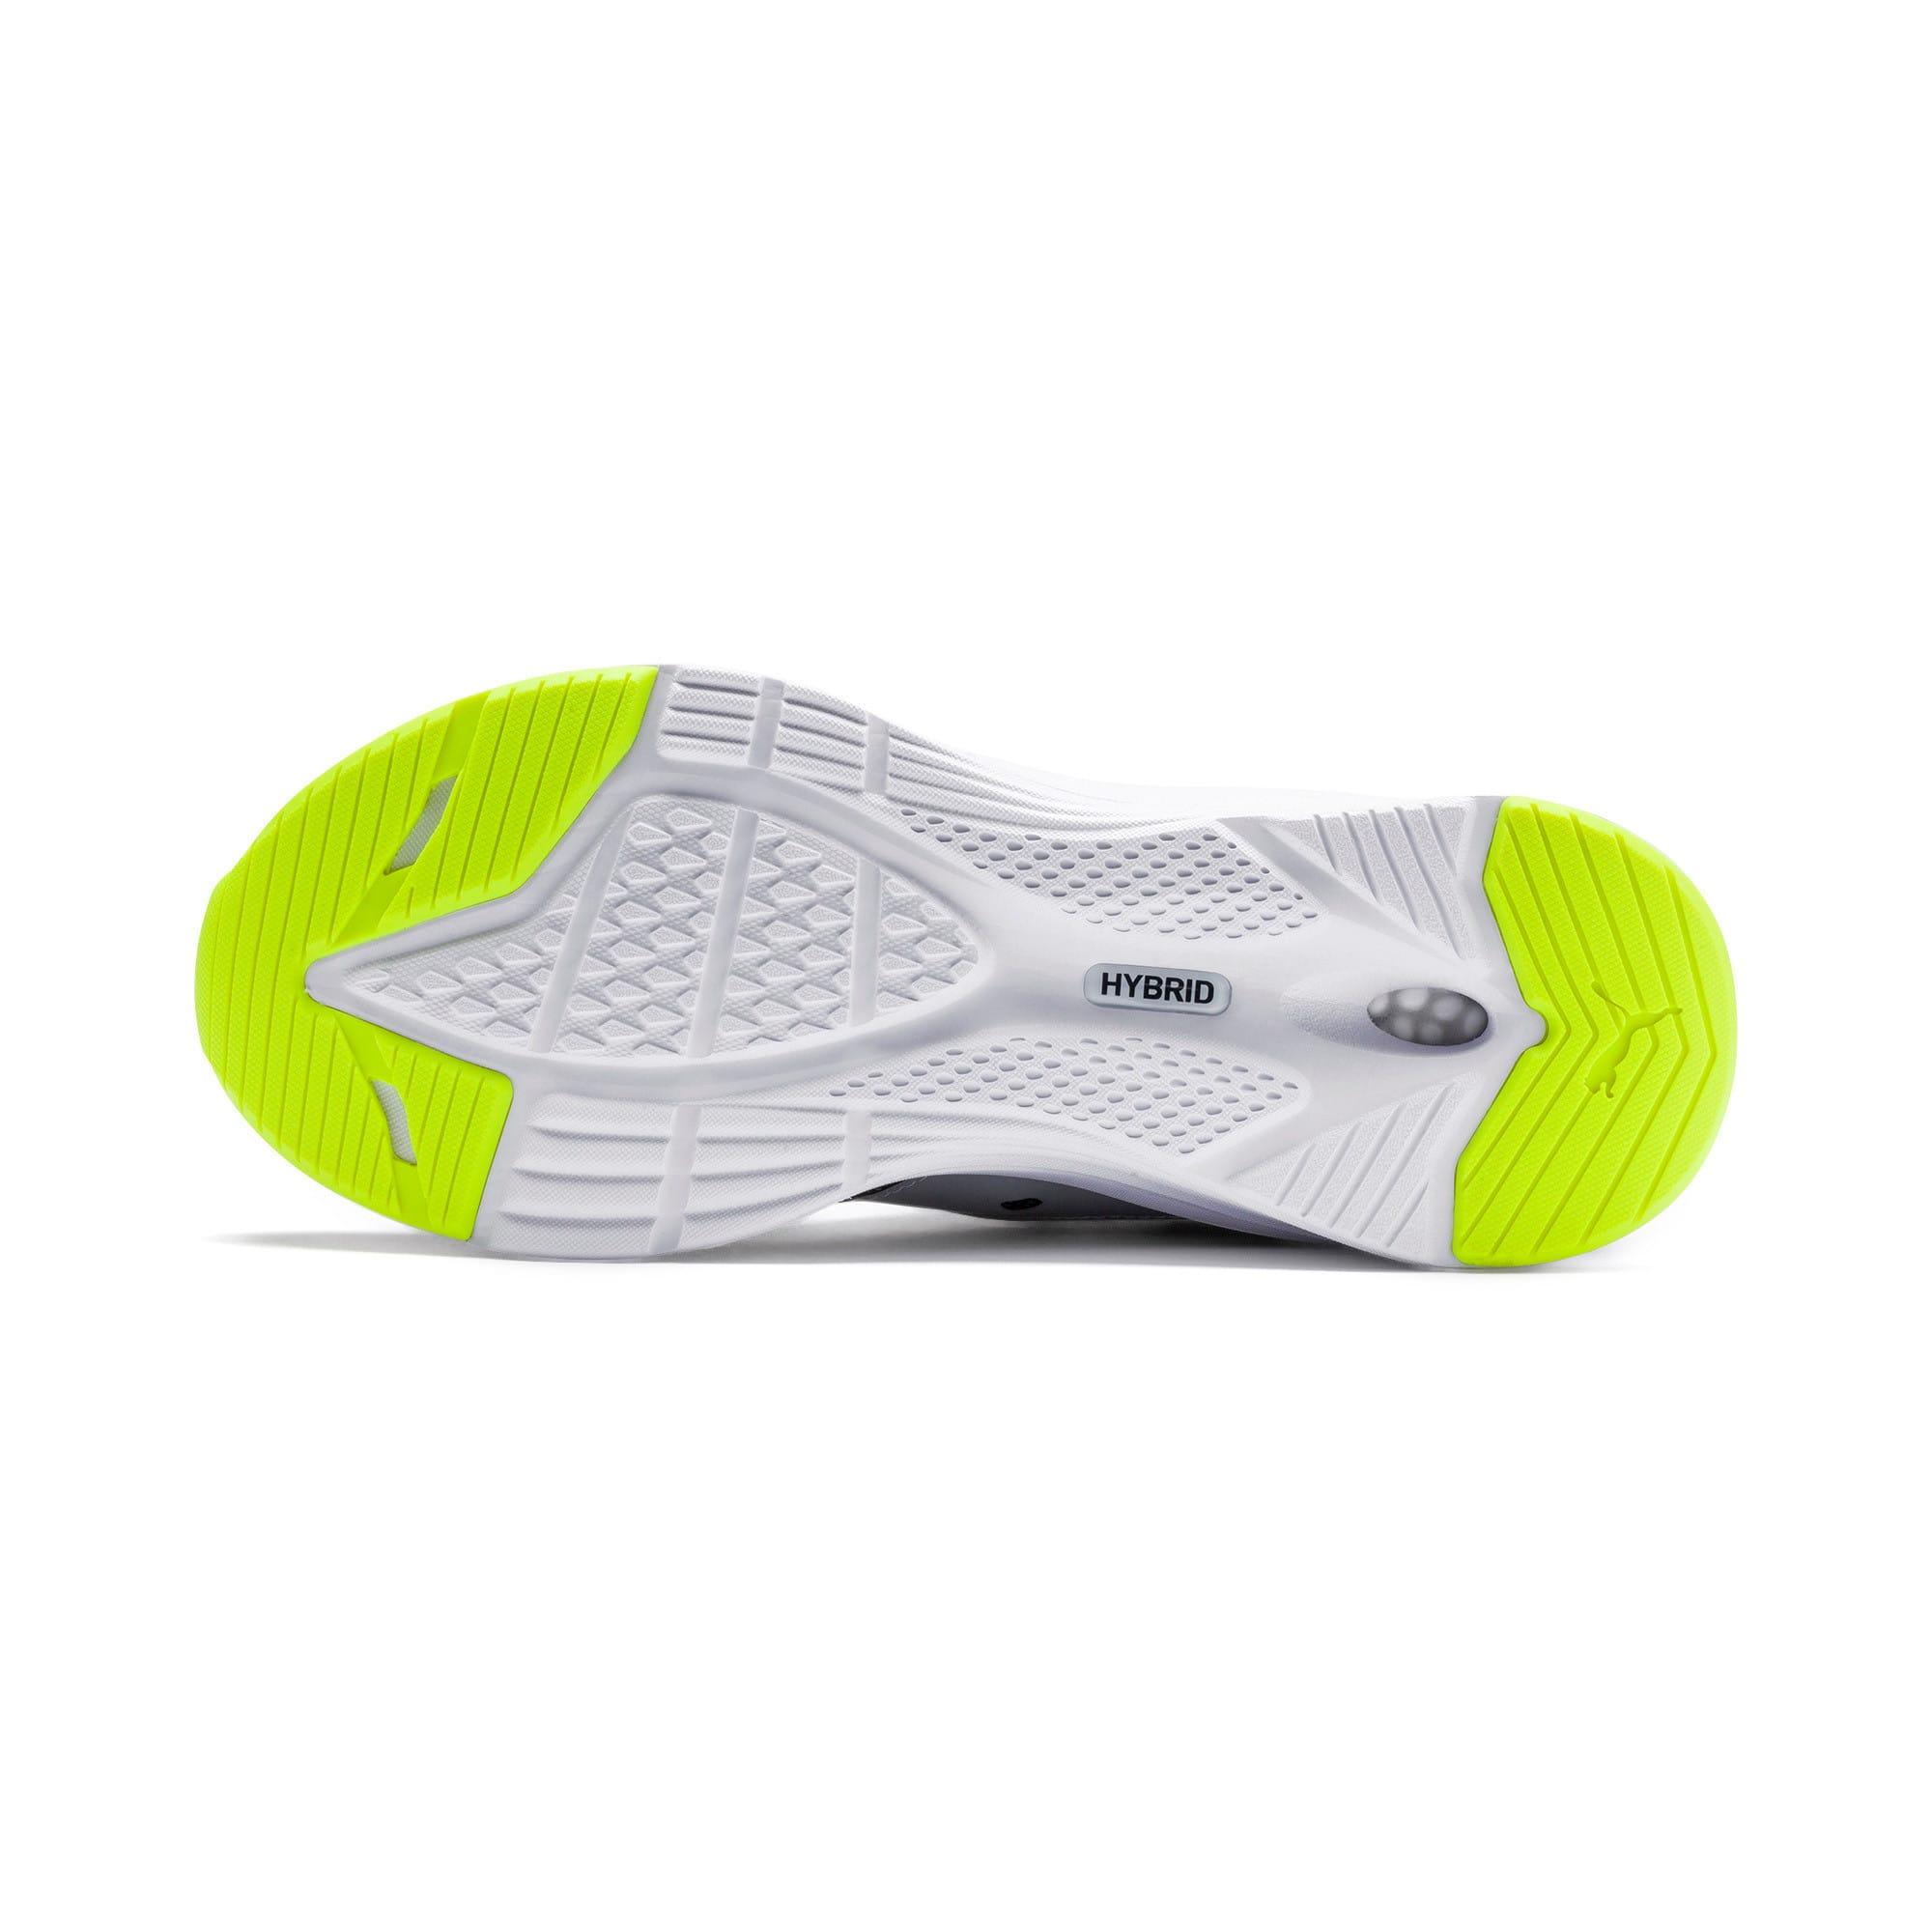 Thumbnail 7 of HYBRID Fuego Shift Women's Running Shoes, Puma Black-Bridal Rose, medium-IND